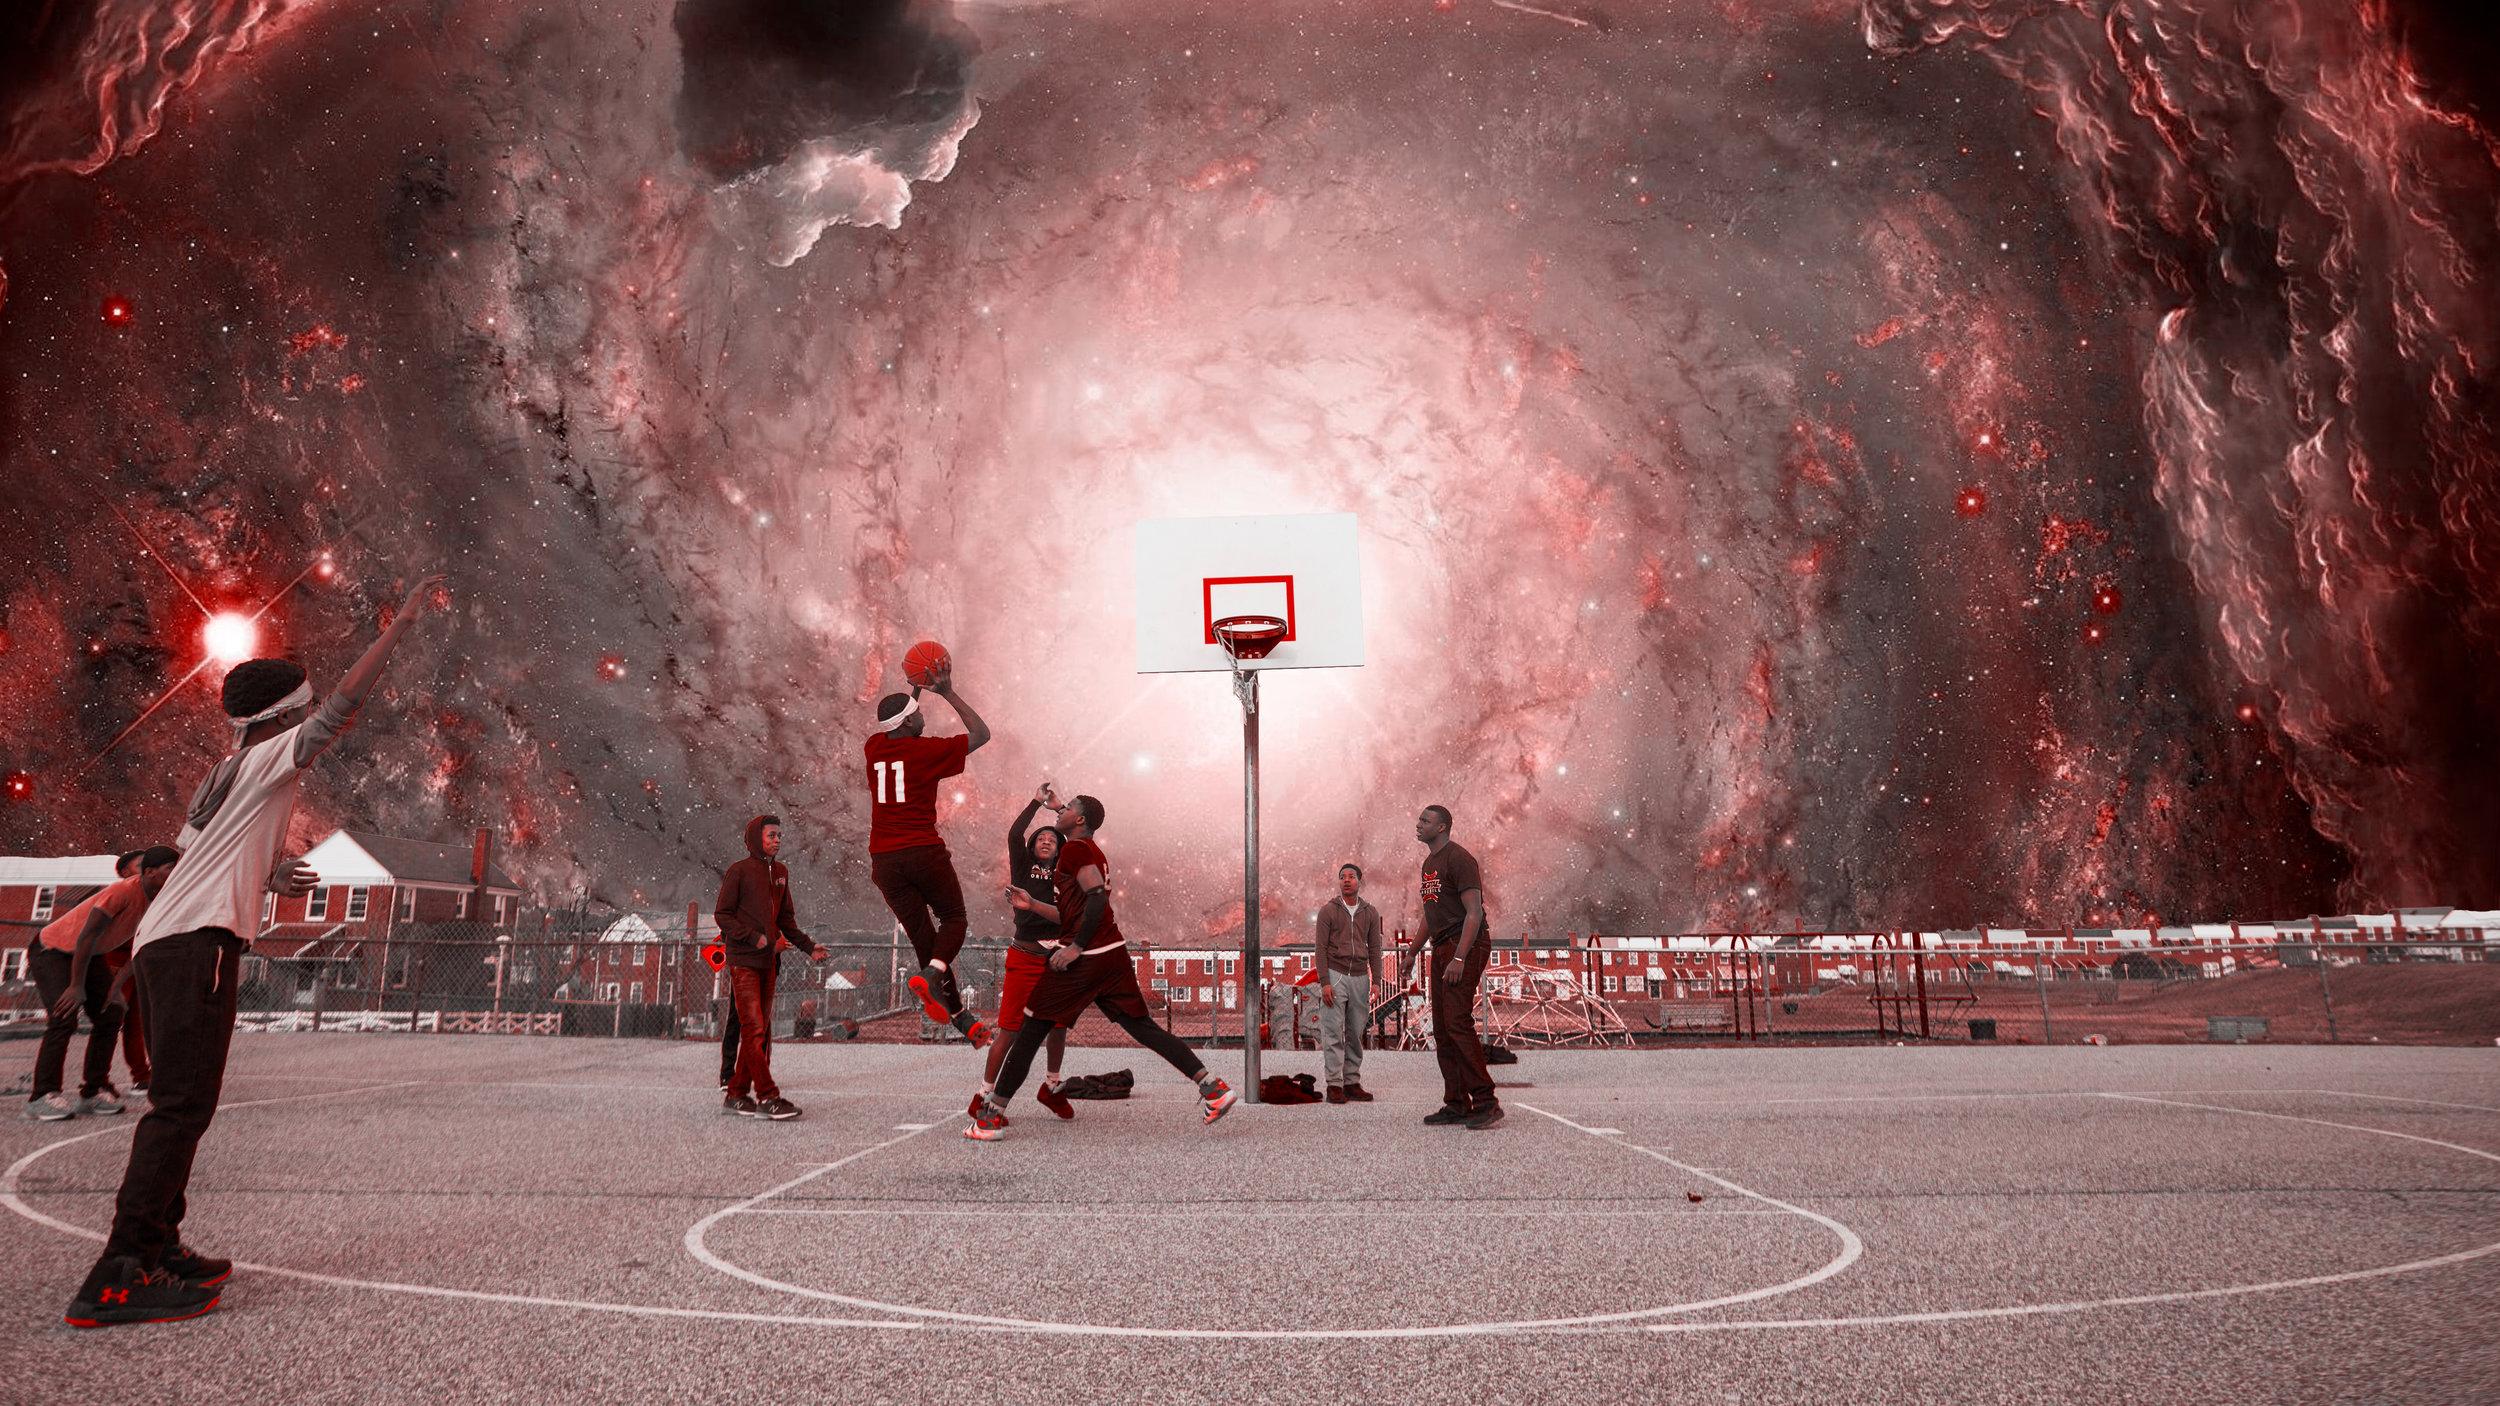 Sinclair Basketball Court.jpg